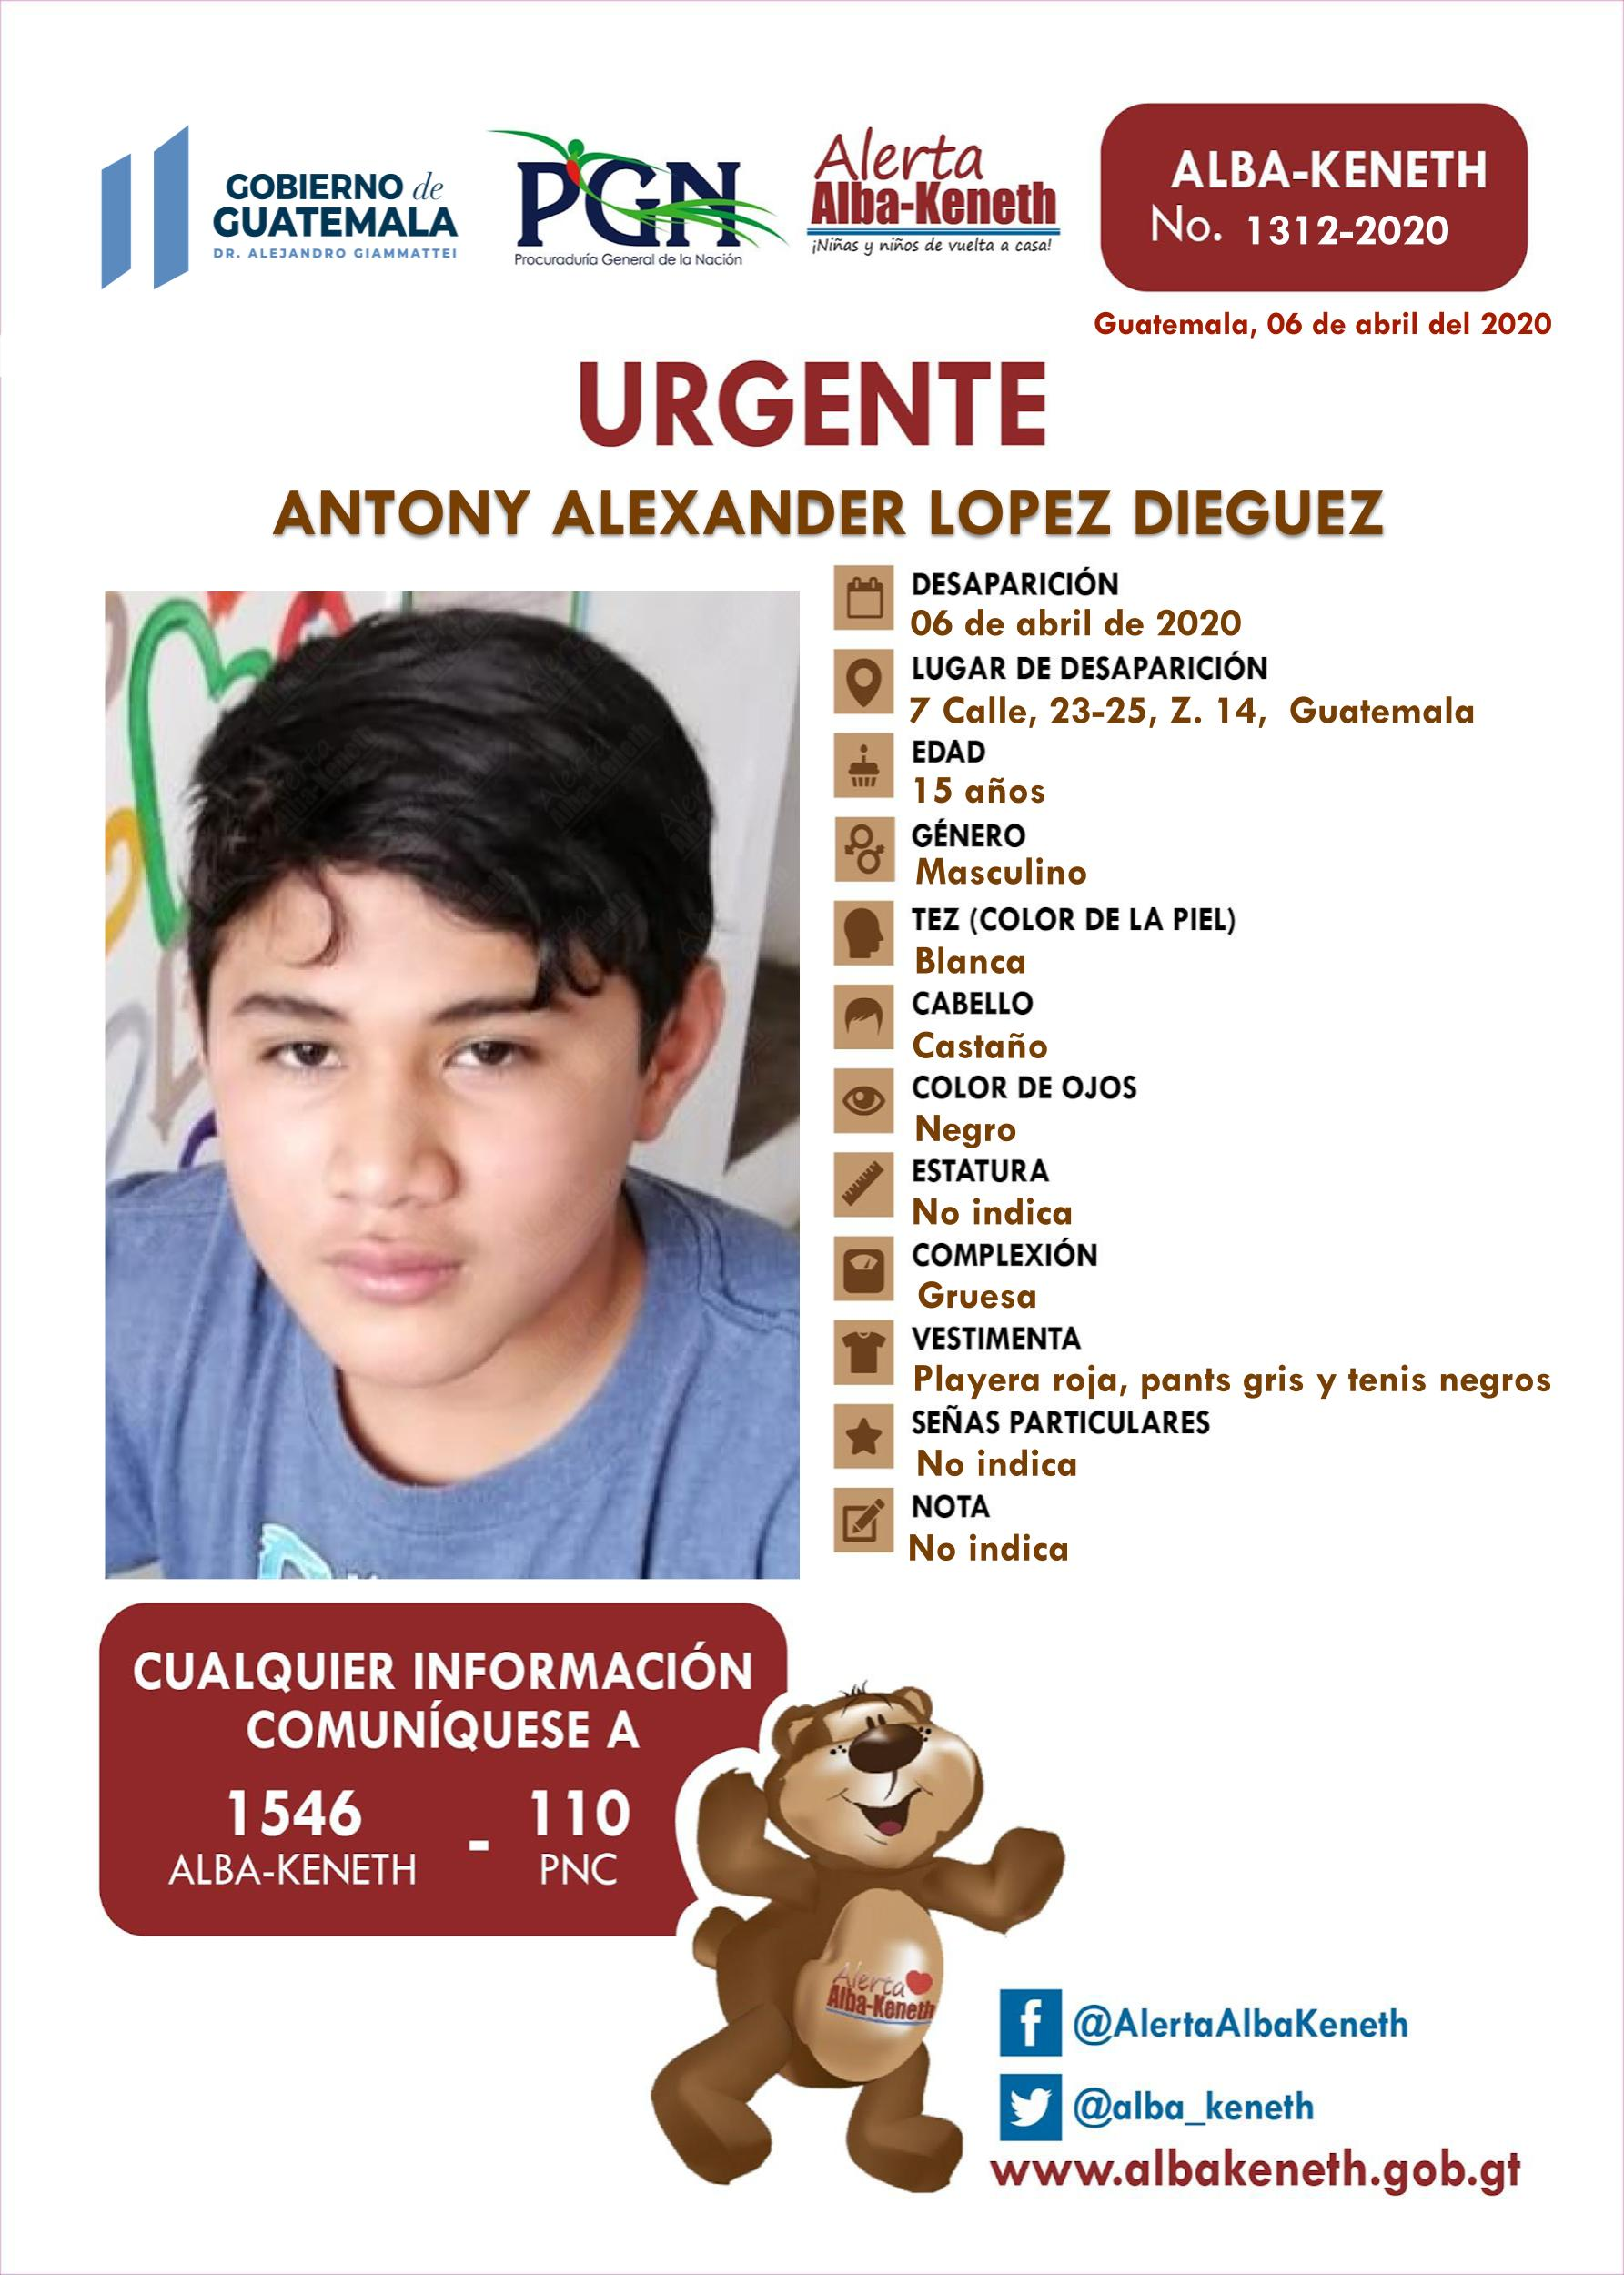 Antony Alexander Lopez Dieguez